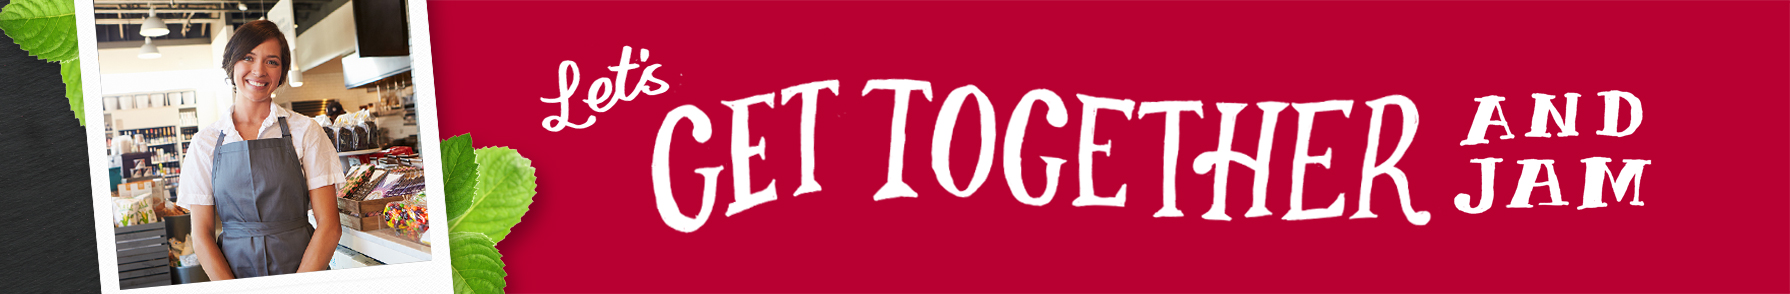 spoonfed-webbannerupdate-aug20-retailers.jpg